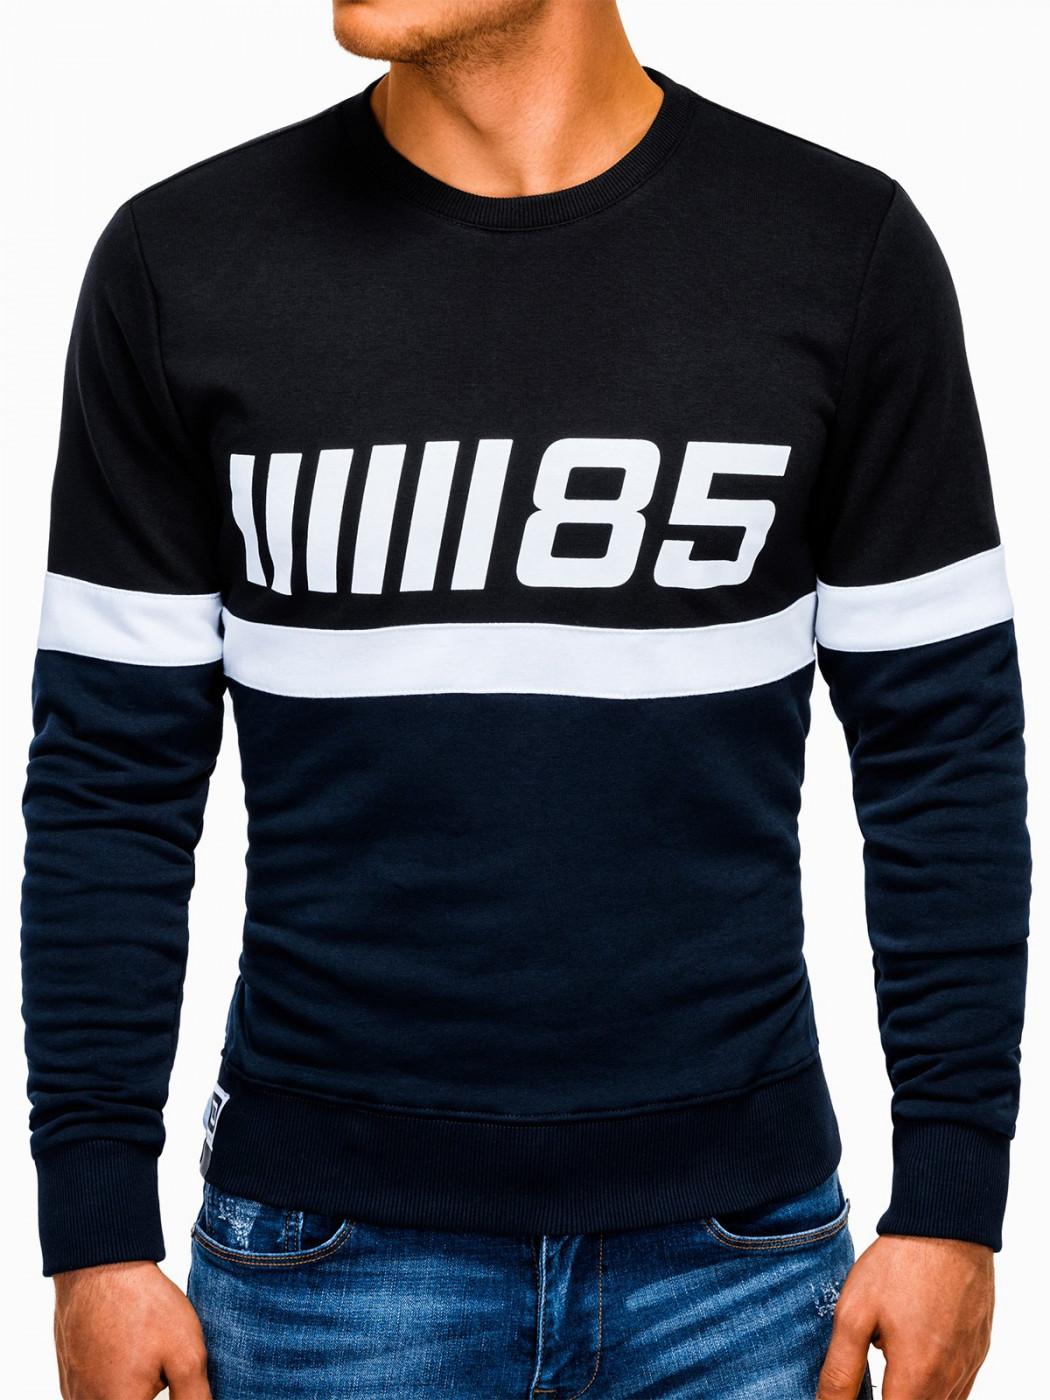 Ombre Clothing Men's printed sweatshirt B934